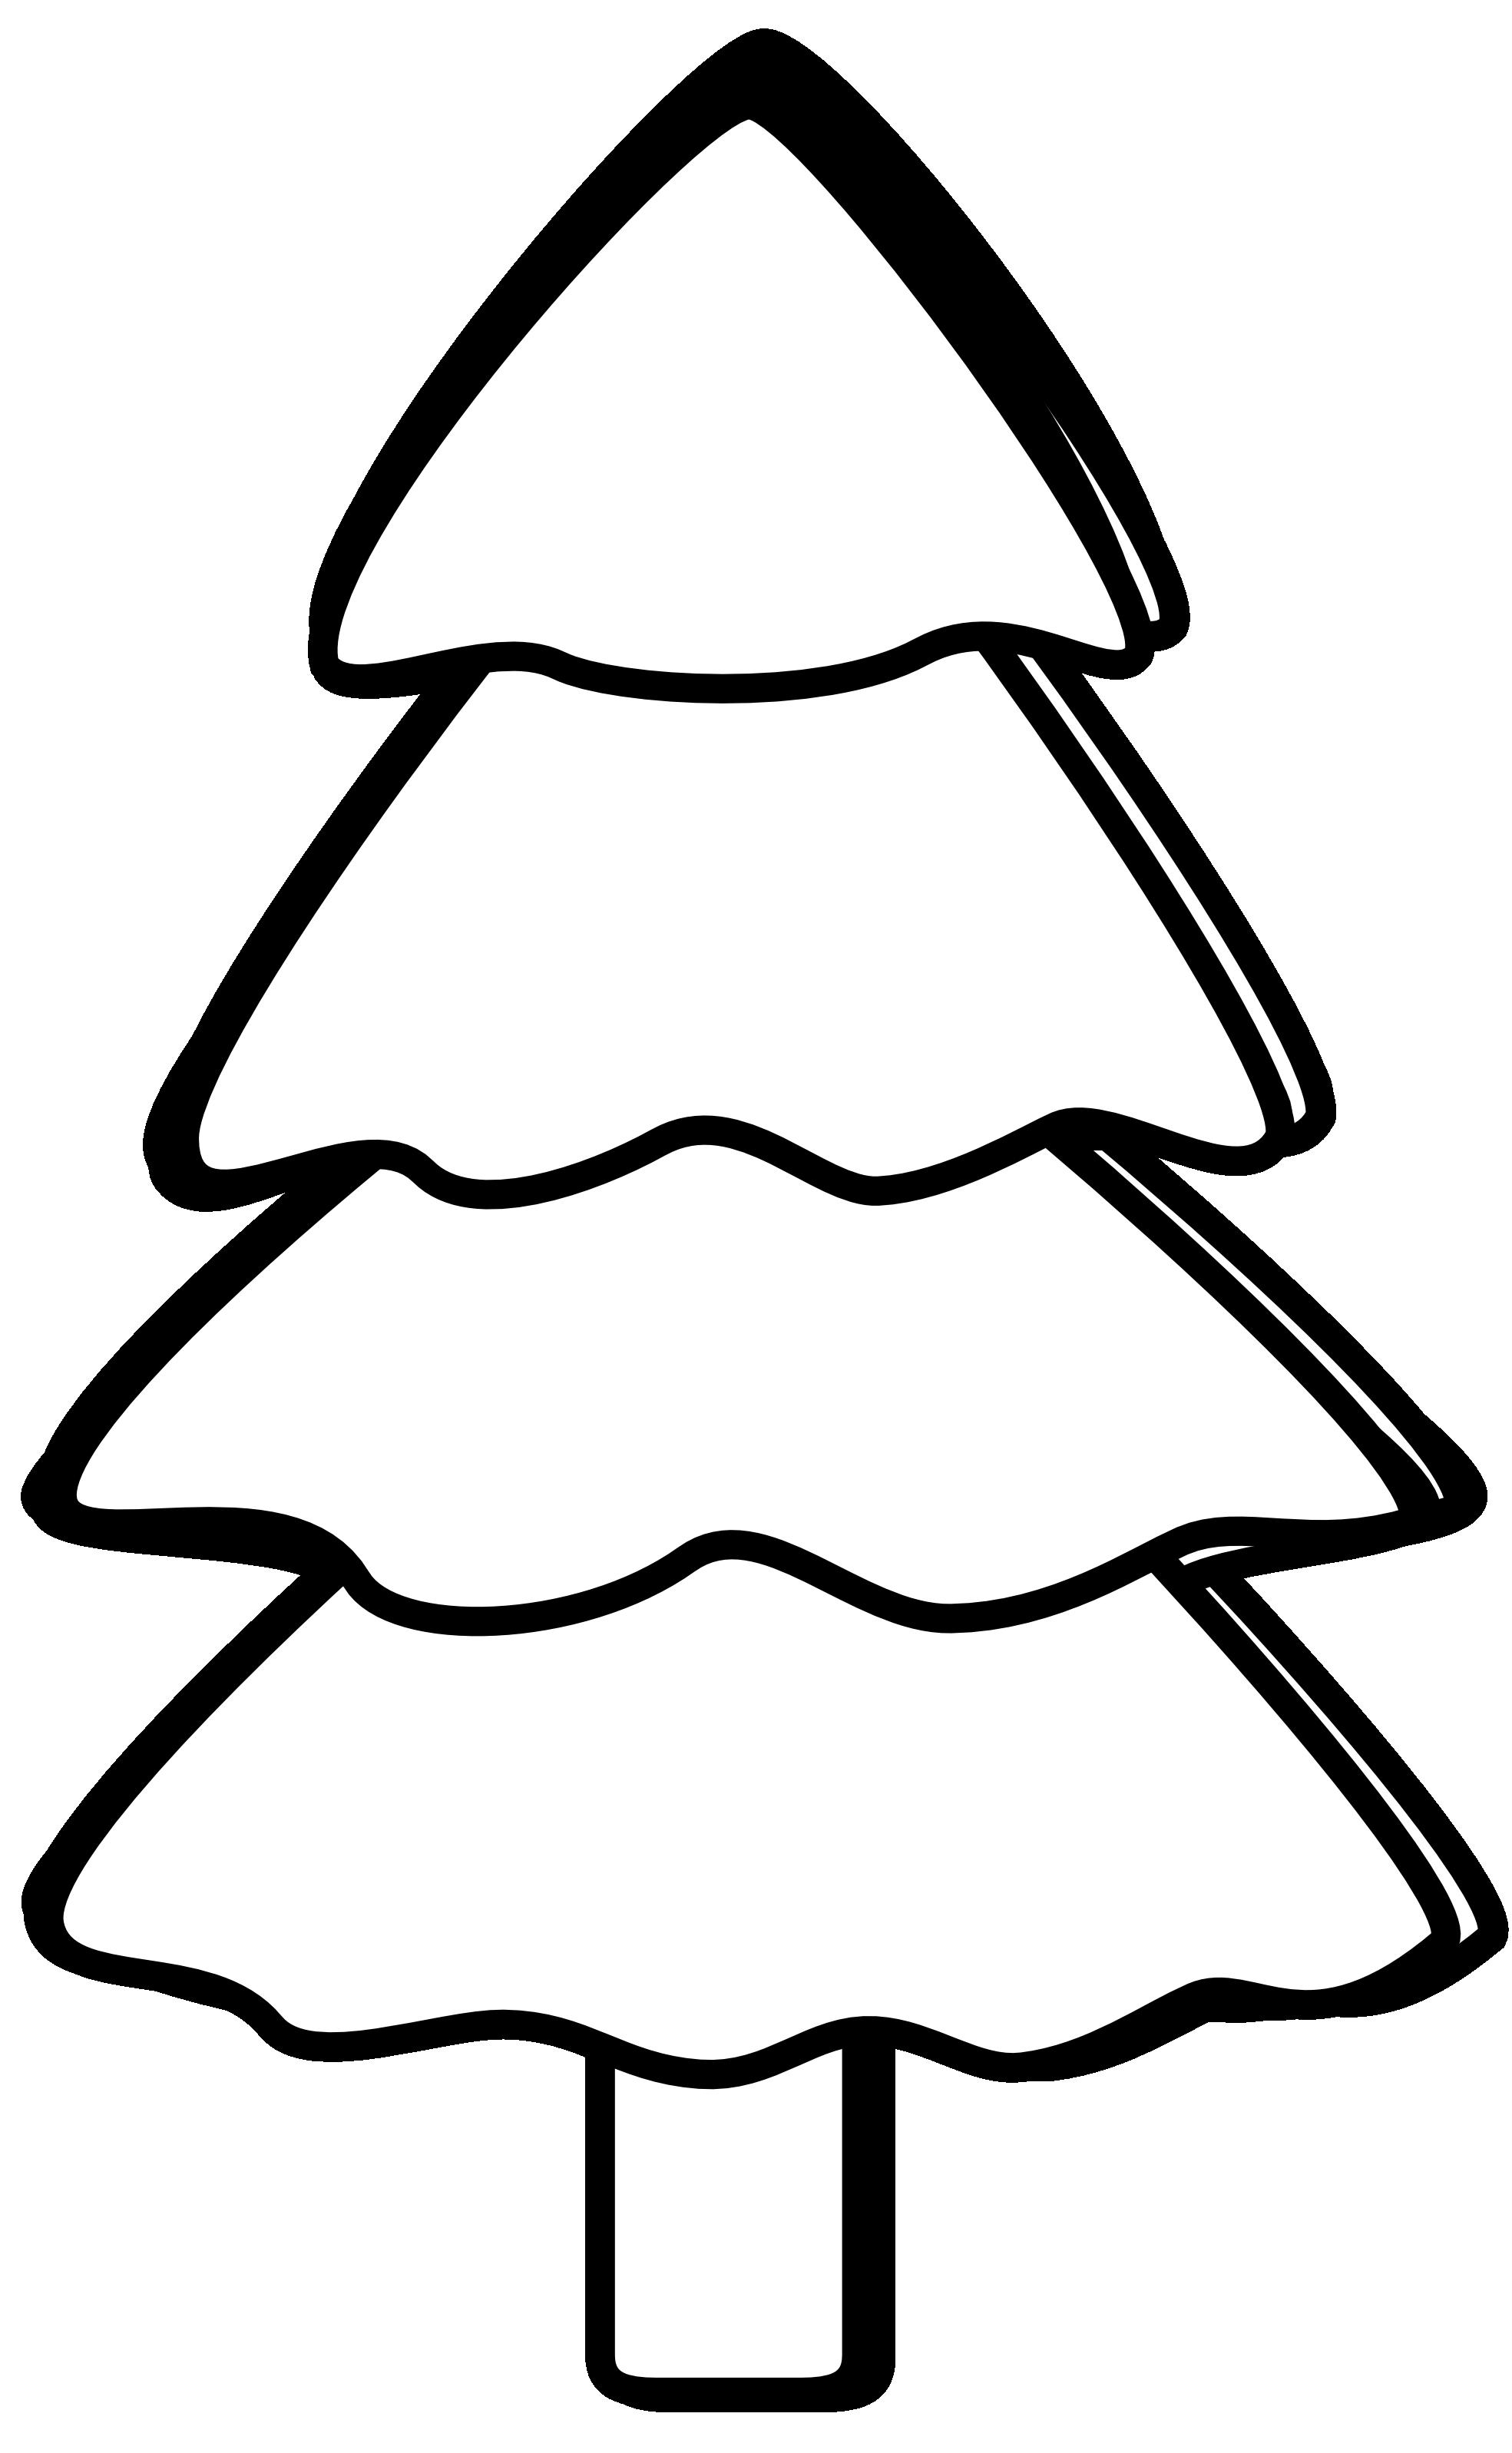 Clip art tree black. Nativity clipart simple